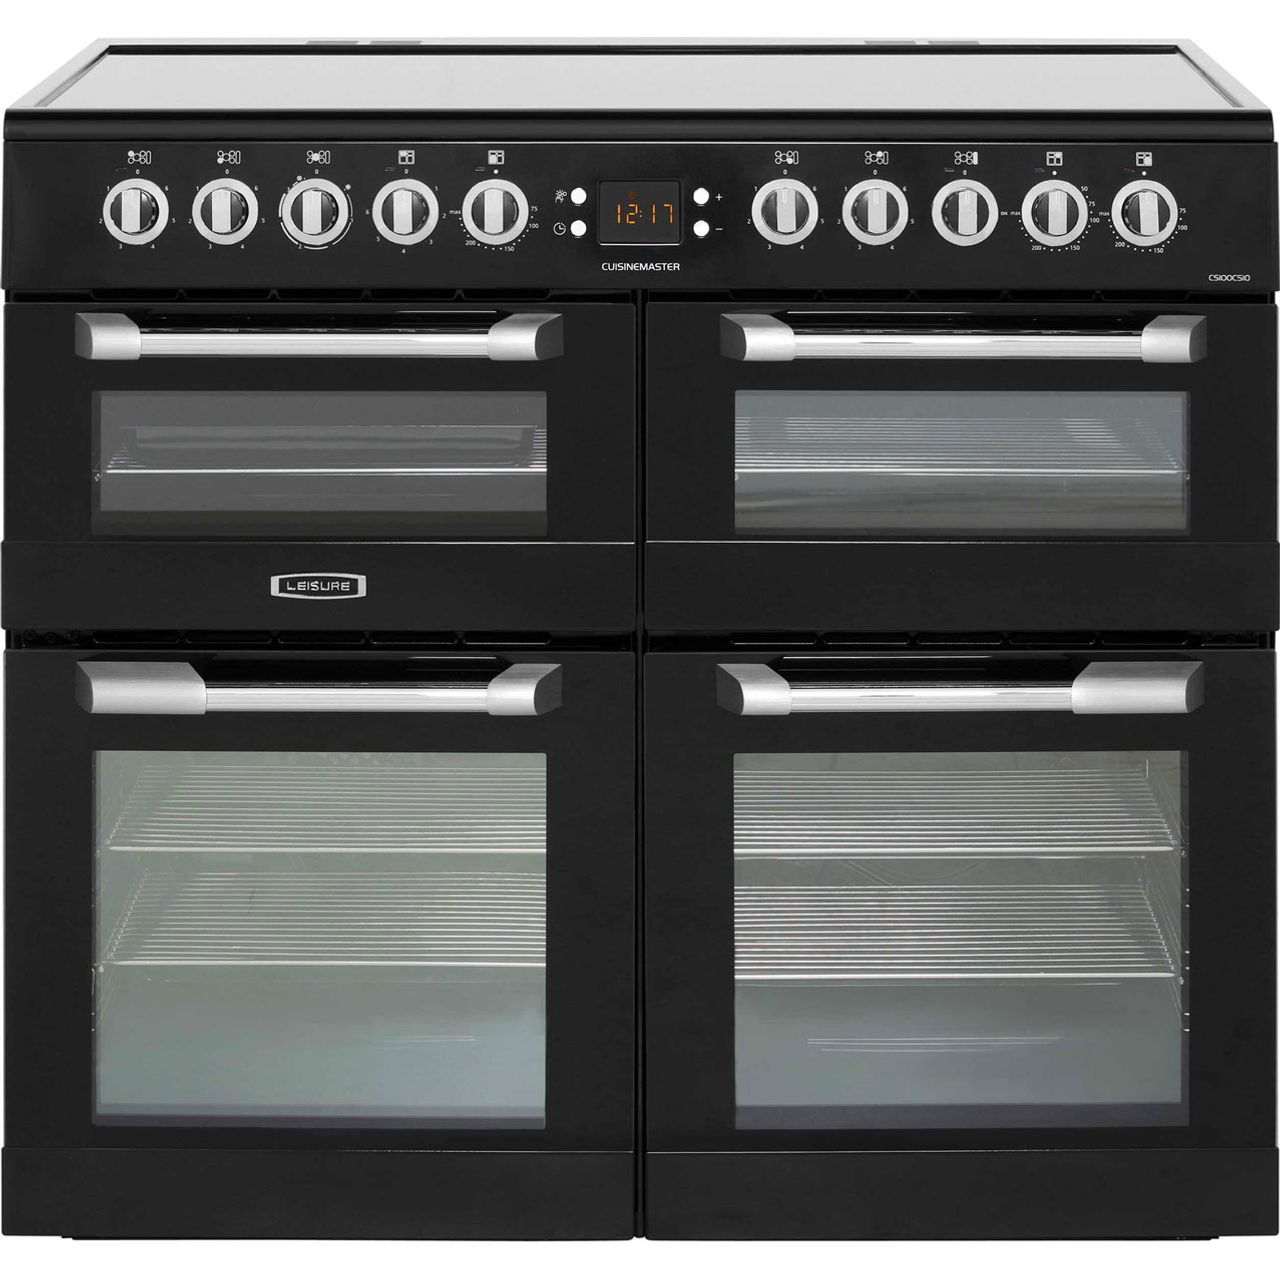 Leisure Cuisinemaster Cs100c510k Electric Range Cooker Black